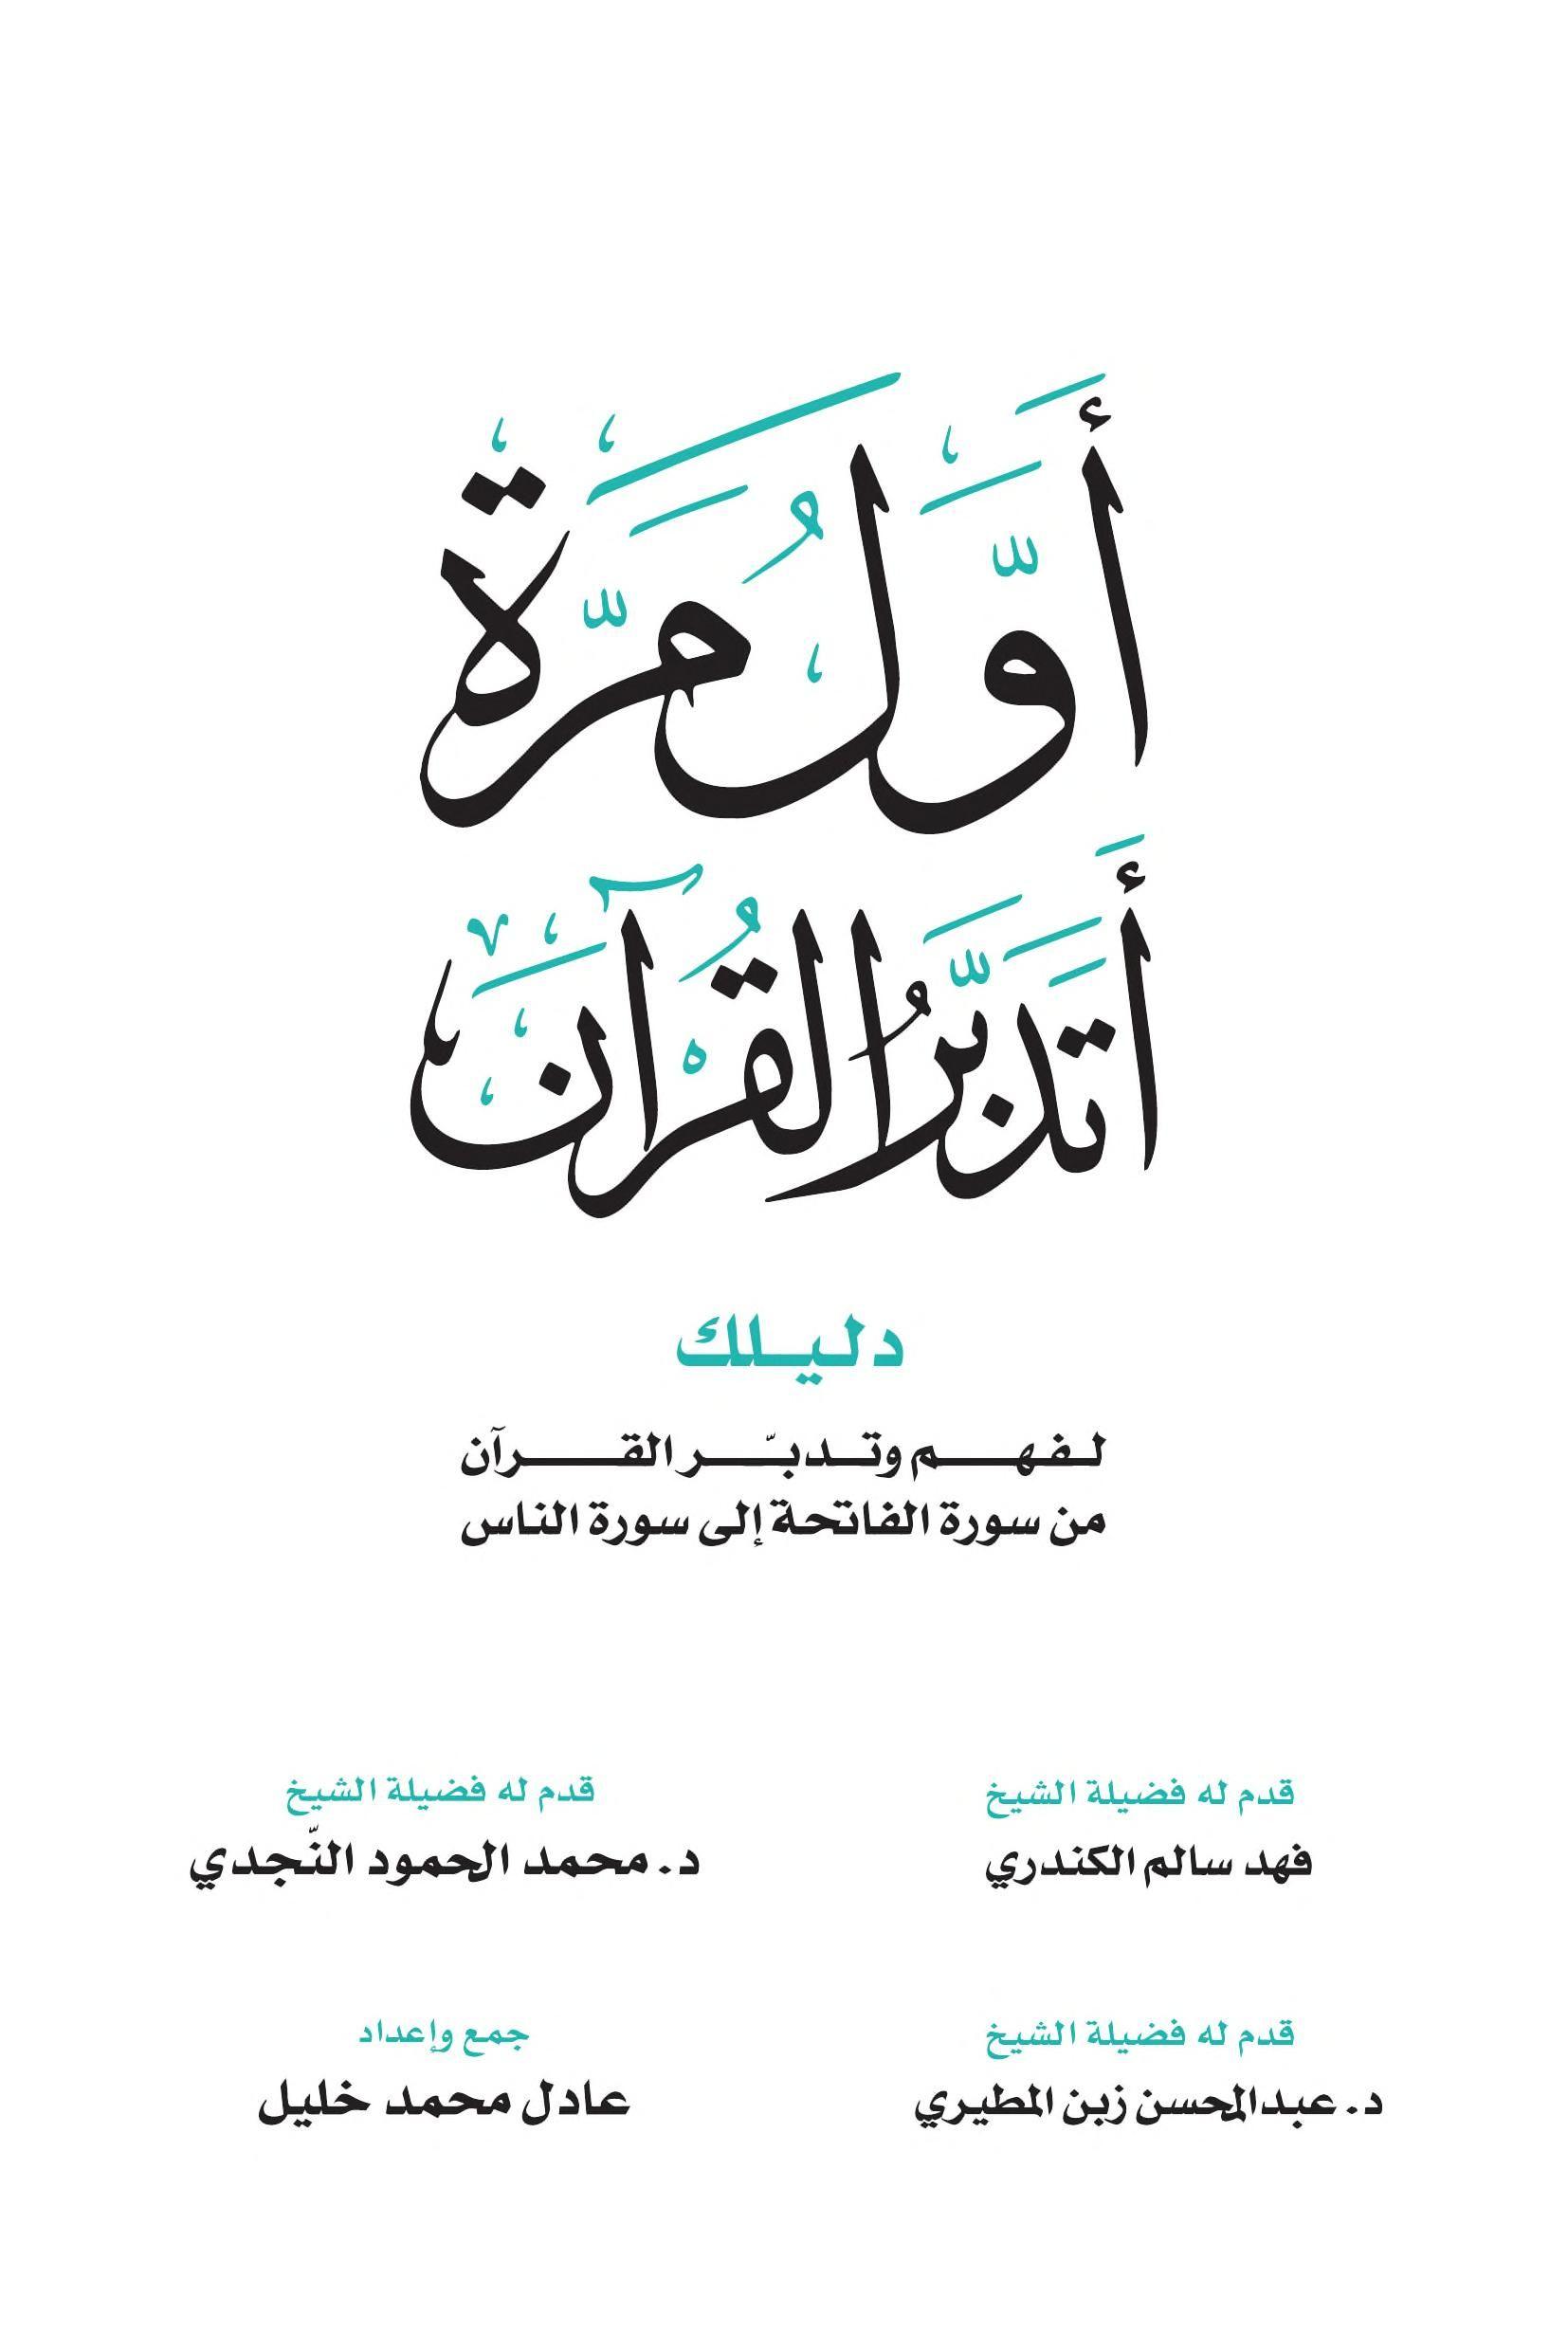 كتاب أول مرة أتدبر القرآن Free Download Borrow And Streaming Internet Archive Ebooks Free Books Book Club Books Pdf Books Reading